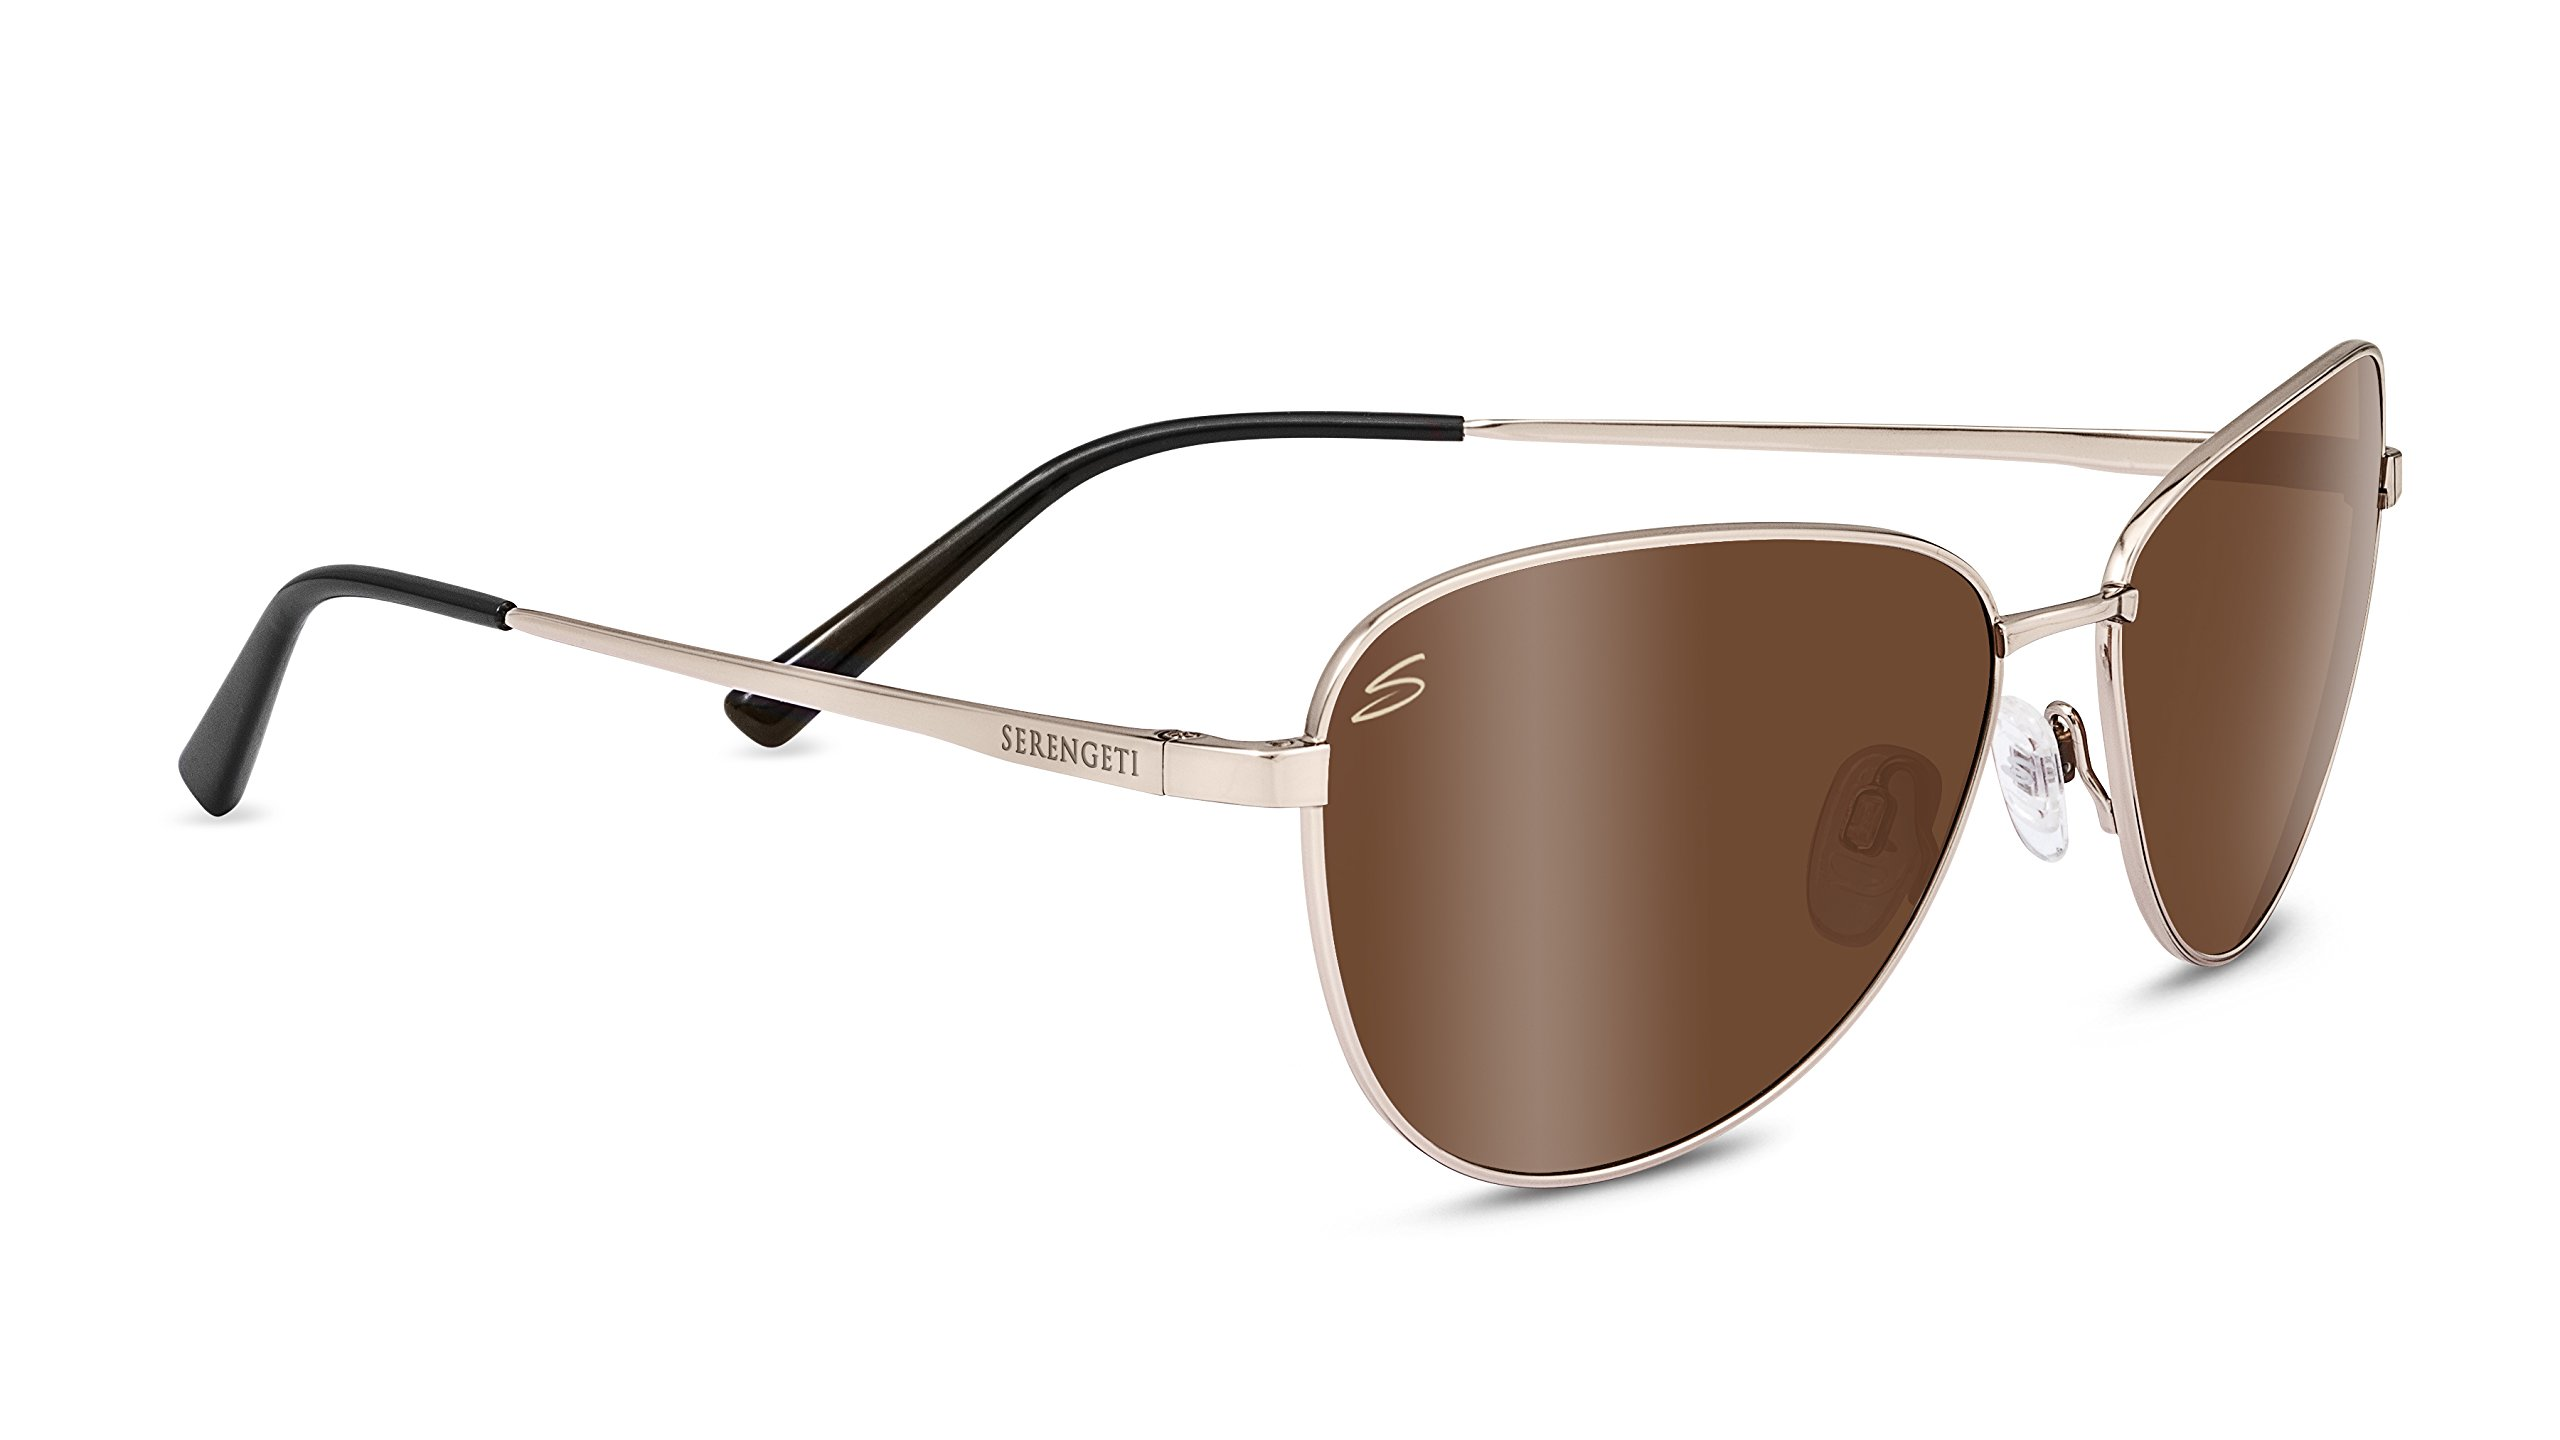 Serengeti 8411 Gloria Polarized Drivers Sunglasses, Soft Satin Gold